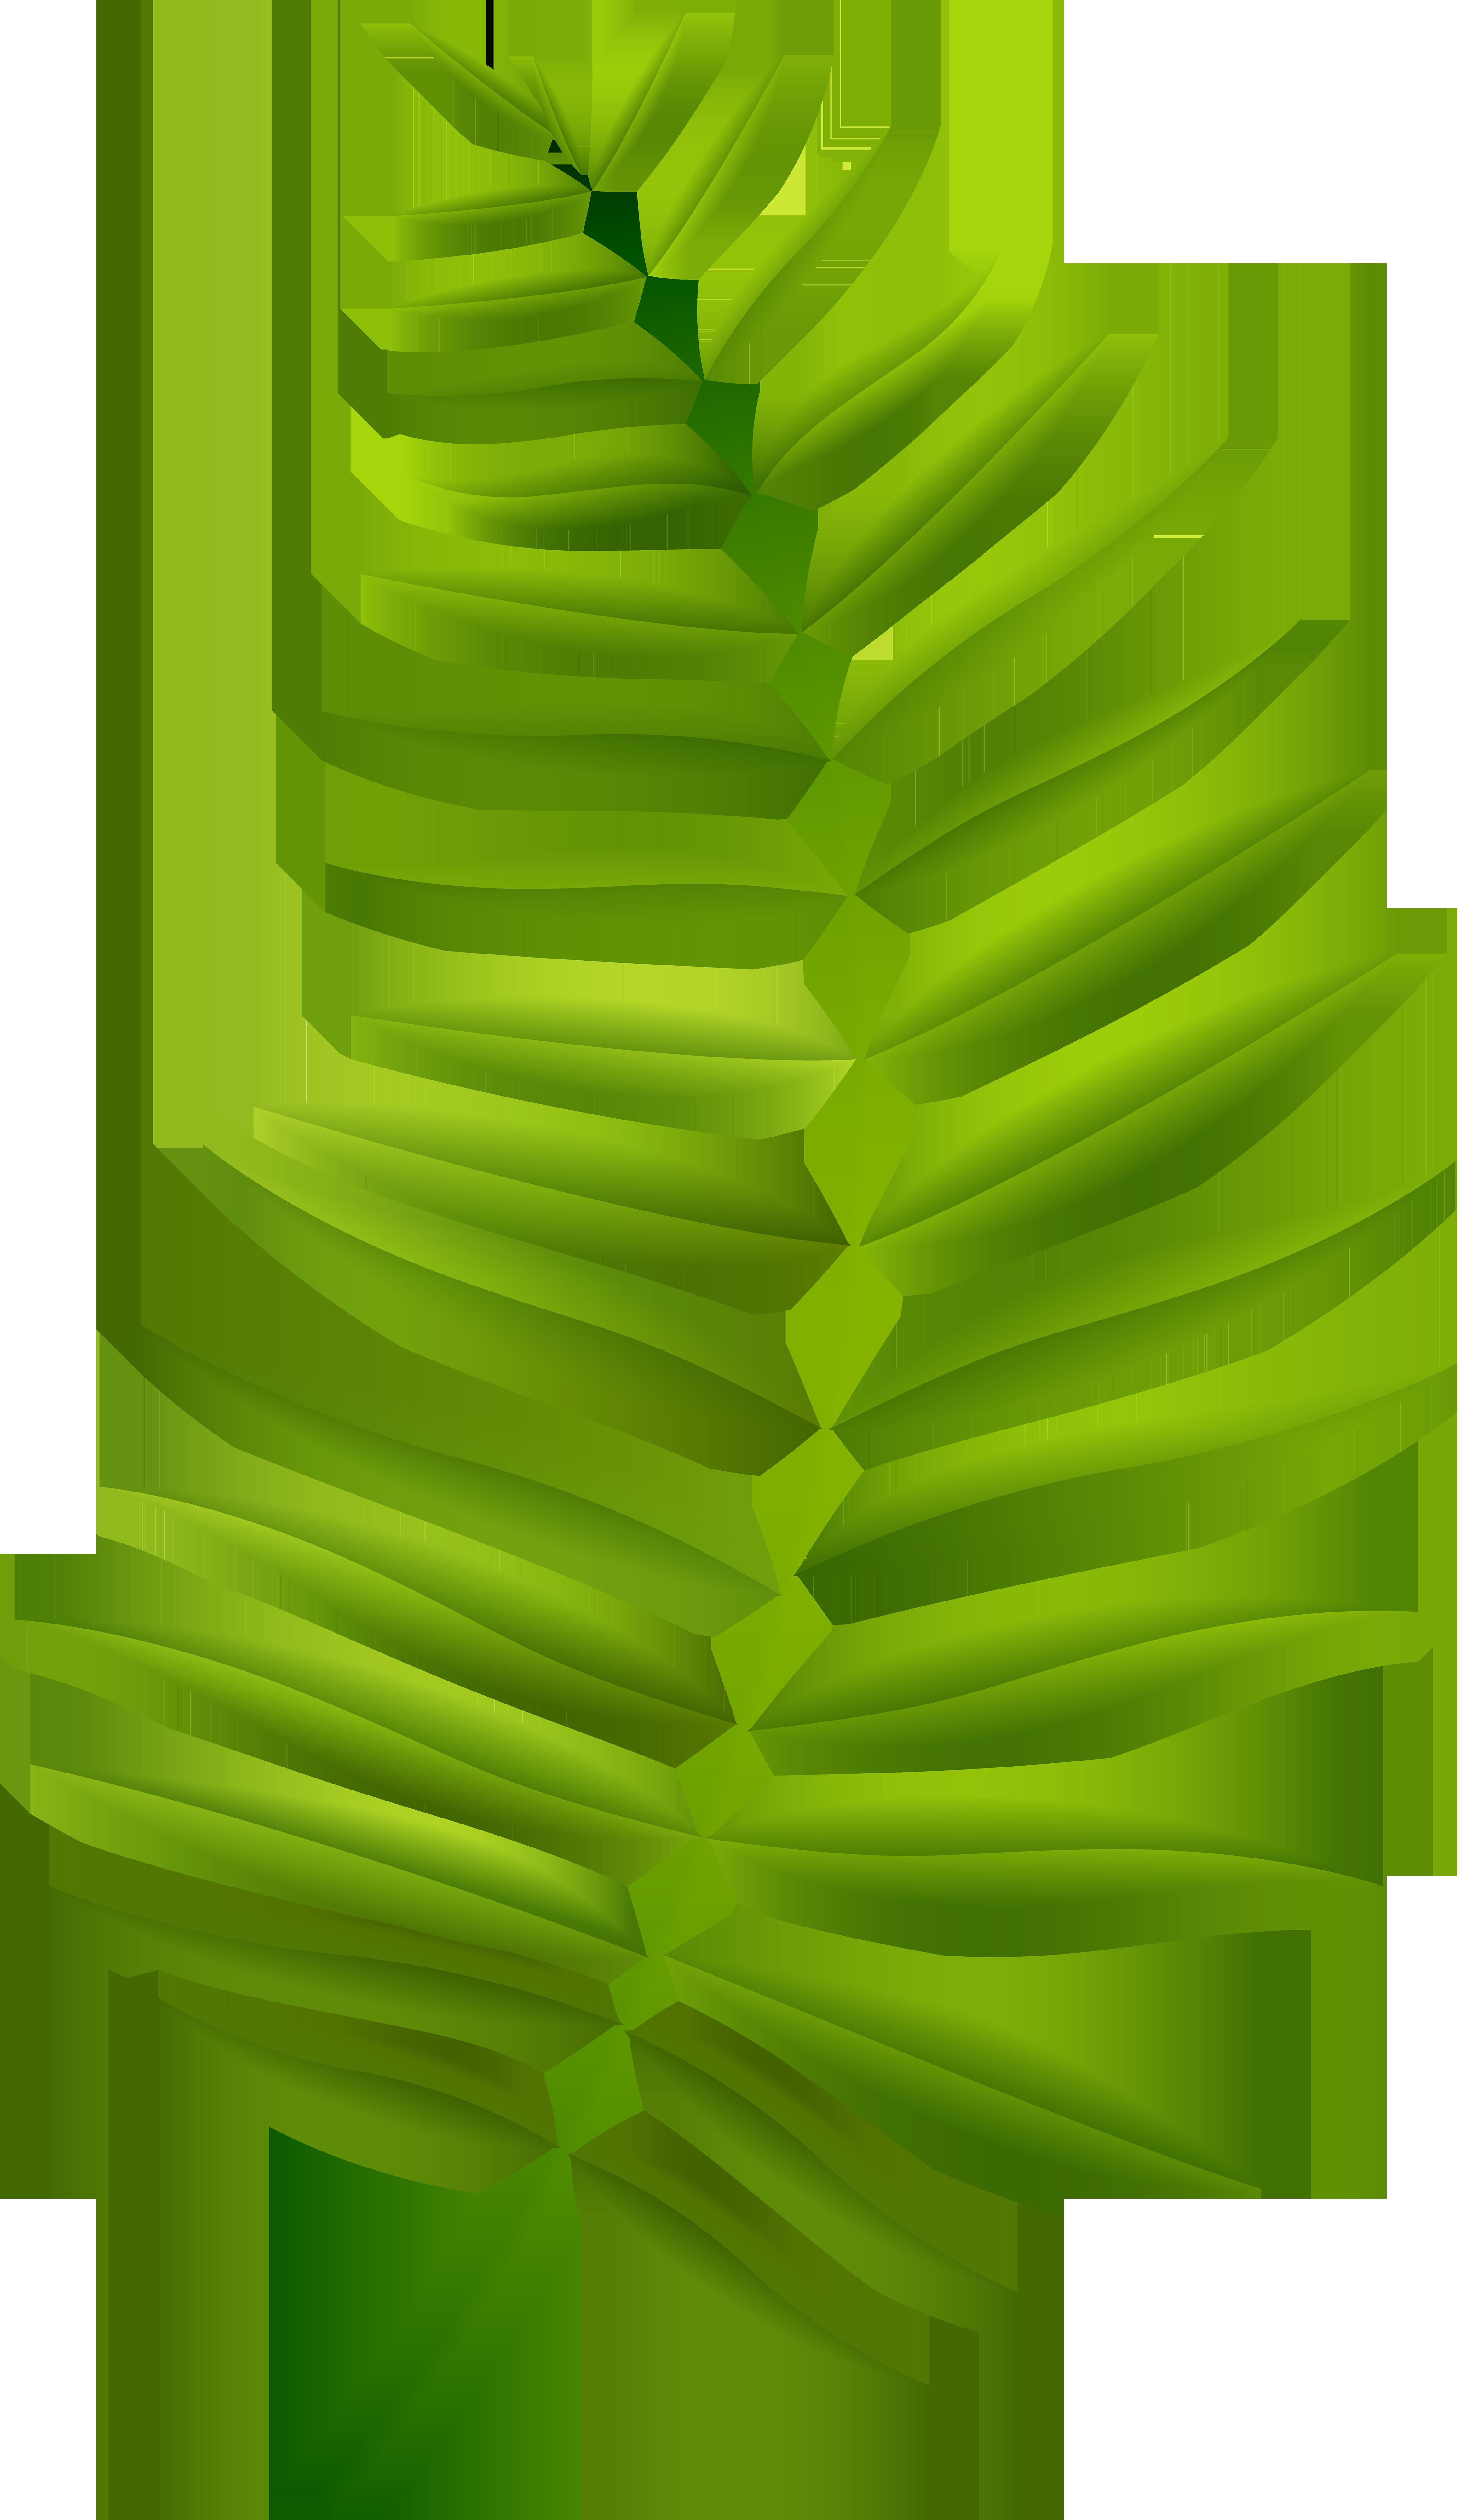 Transparent clip art image. Palm clipart green branch